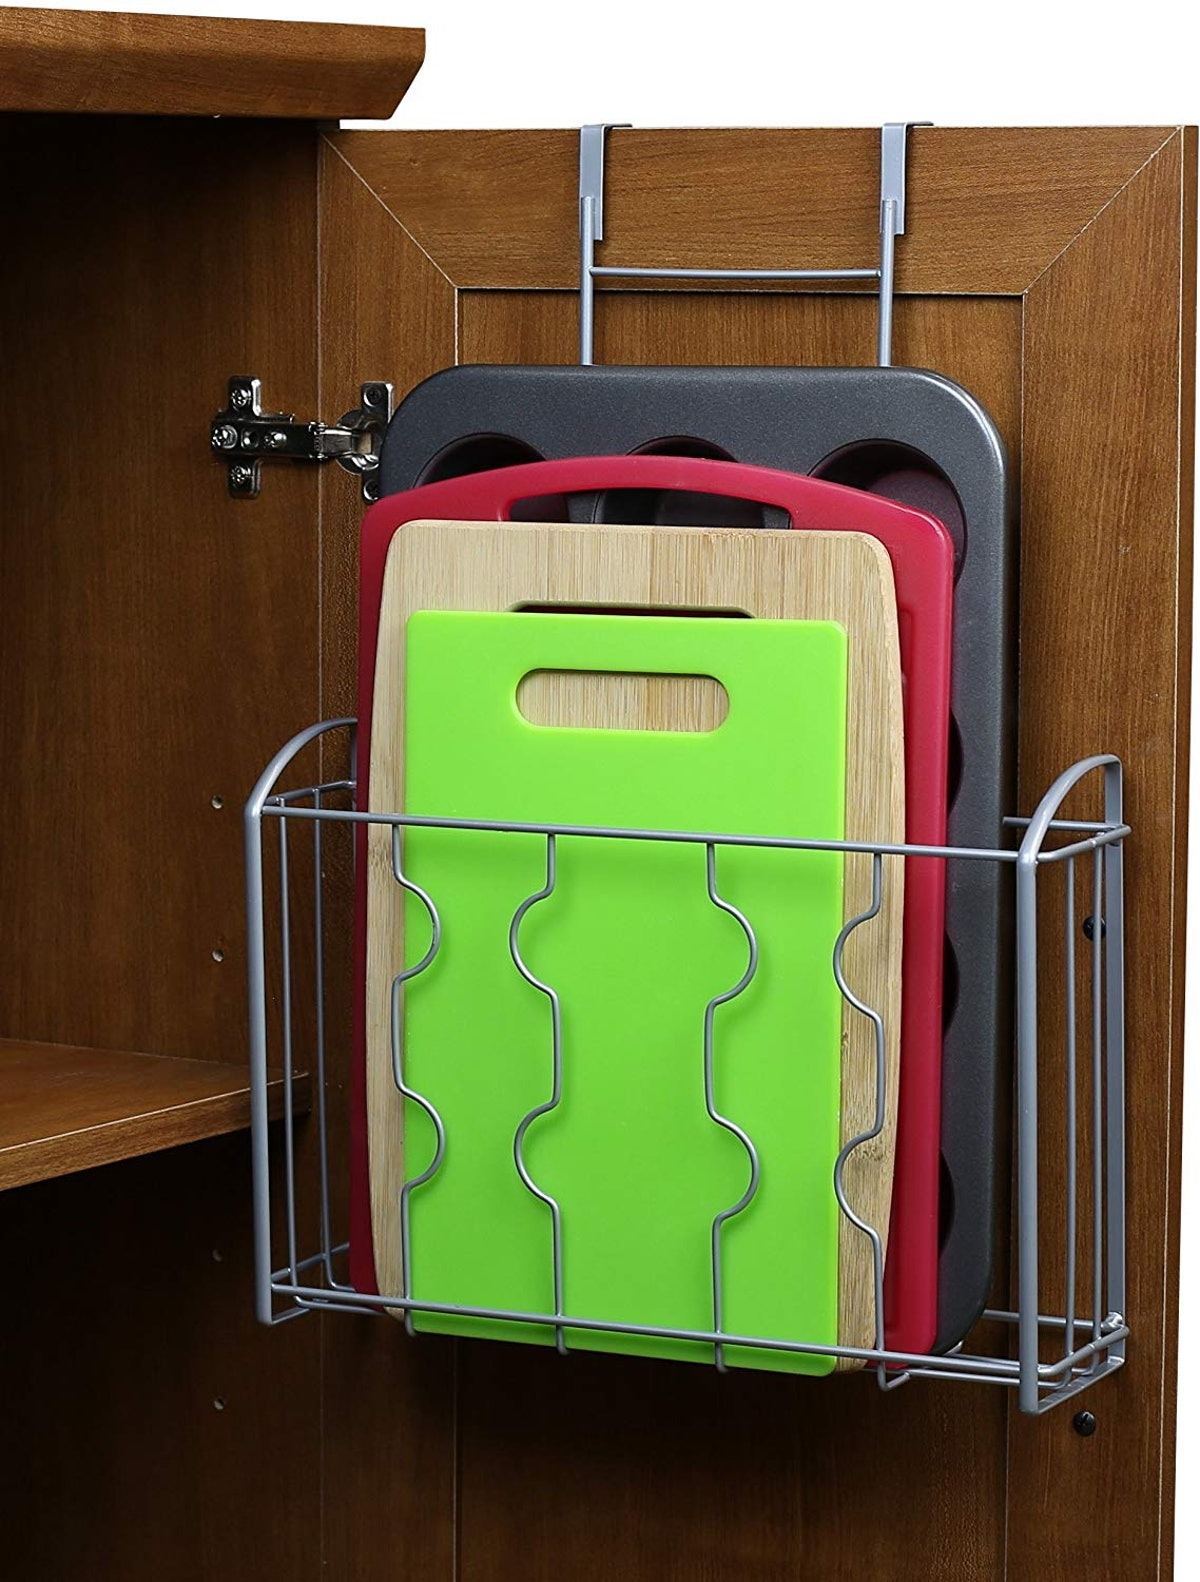 Simple Houseware Over the Cabinet Door Organizer Holder